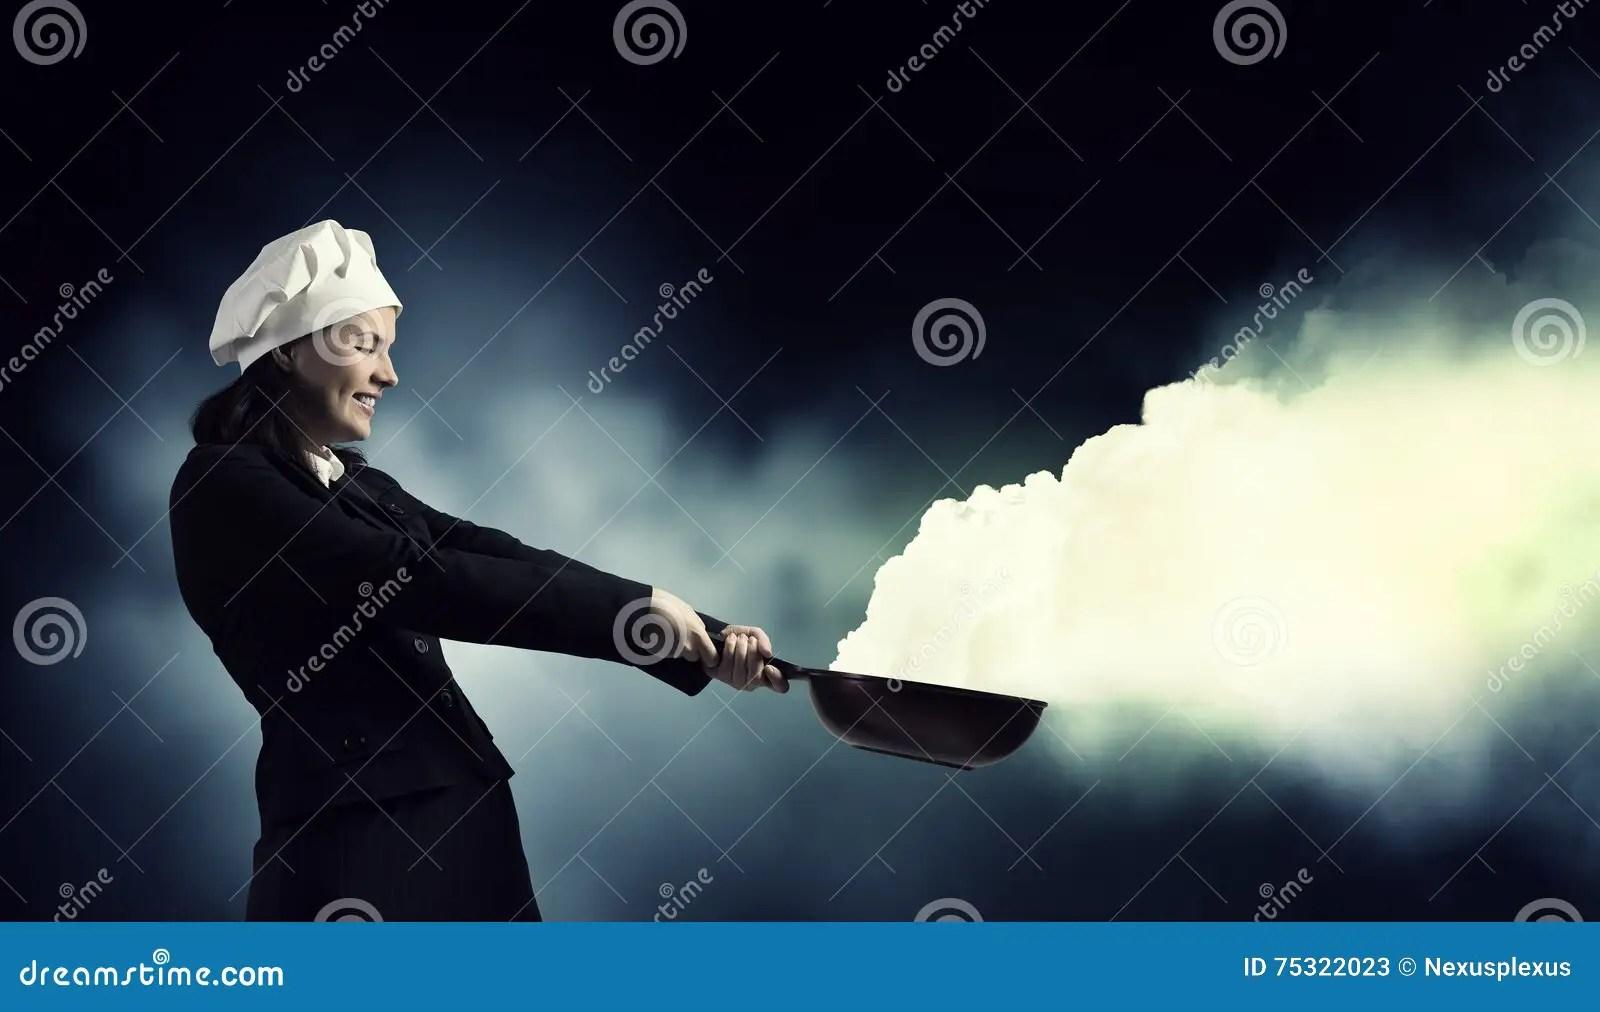 kitchen magician trim 她是魔术师作为厨师混合画法库存图片 图片包括有主妇 魔术 厨房 商业 她是魔术师作为厨师混合画法